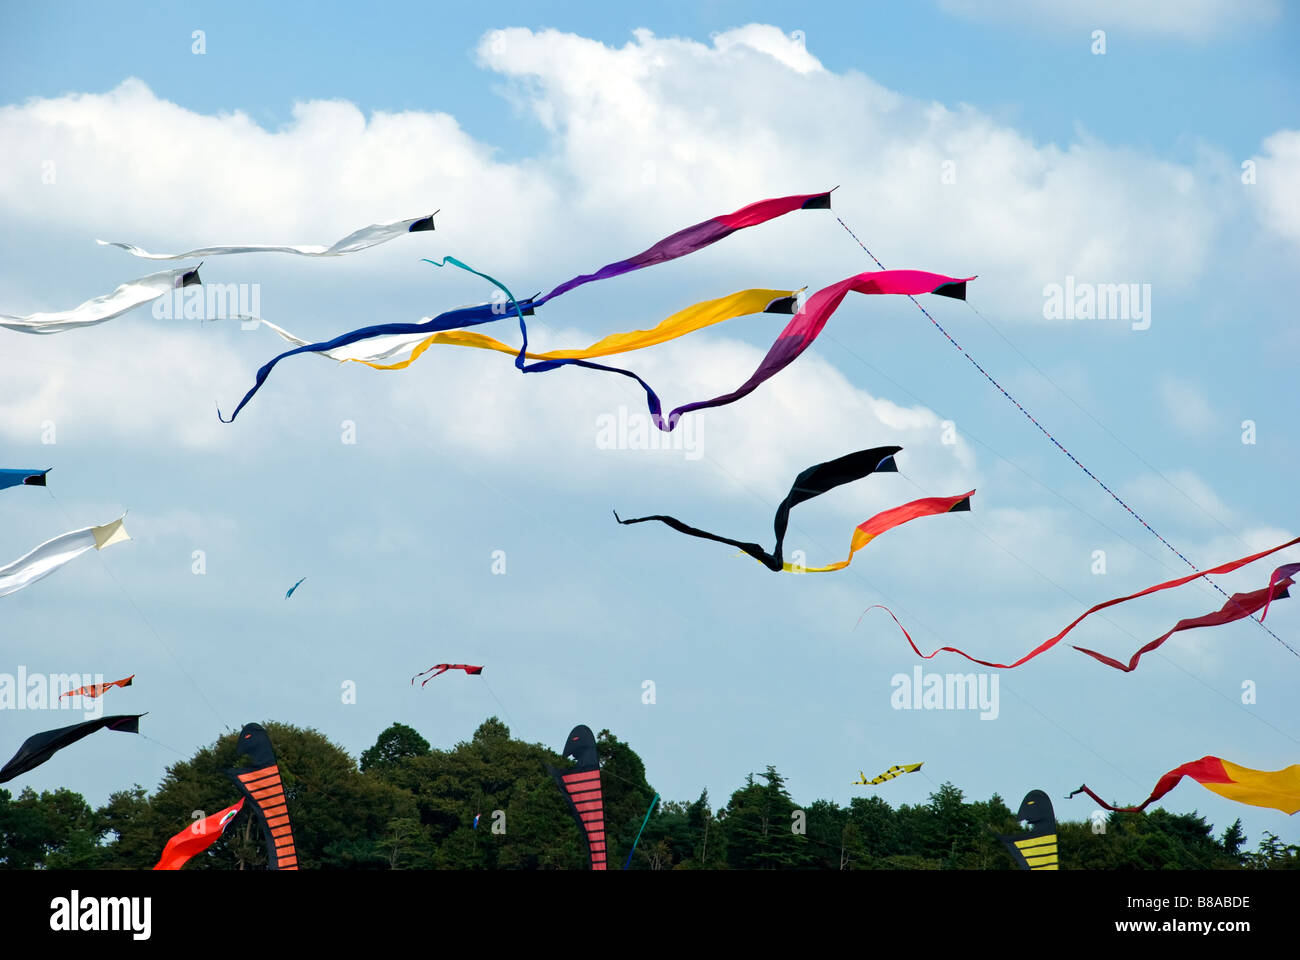 Kite display of colourful ribbon shaped kites taken at the Bristol kite festival, uk in summer. - Stock Image